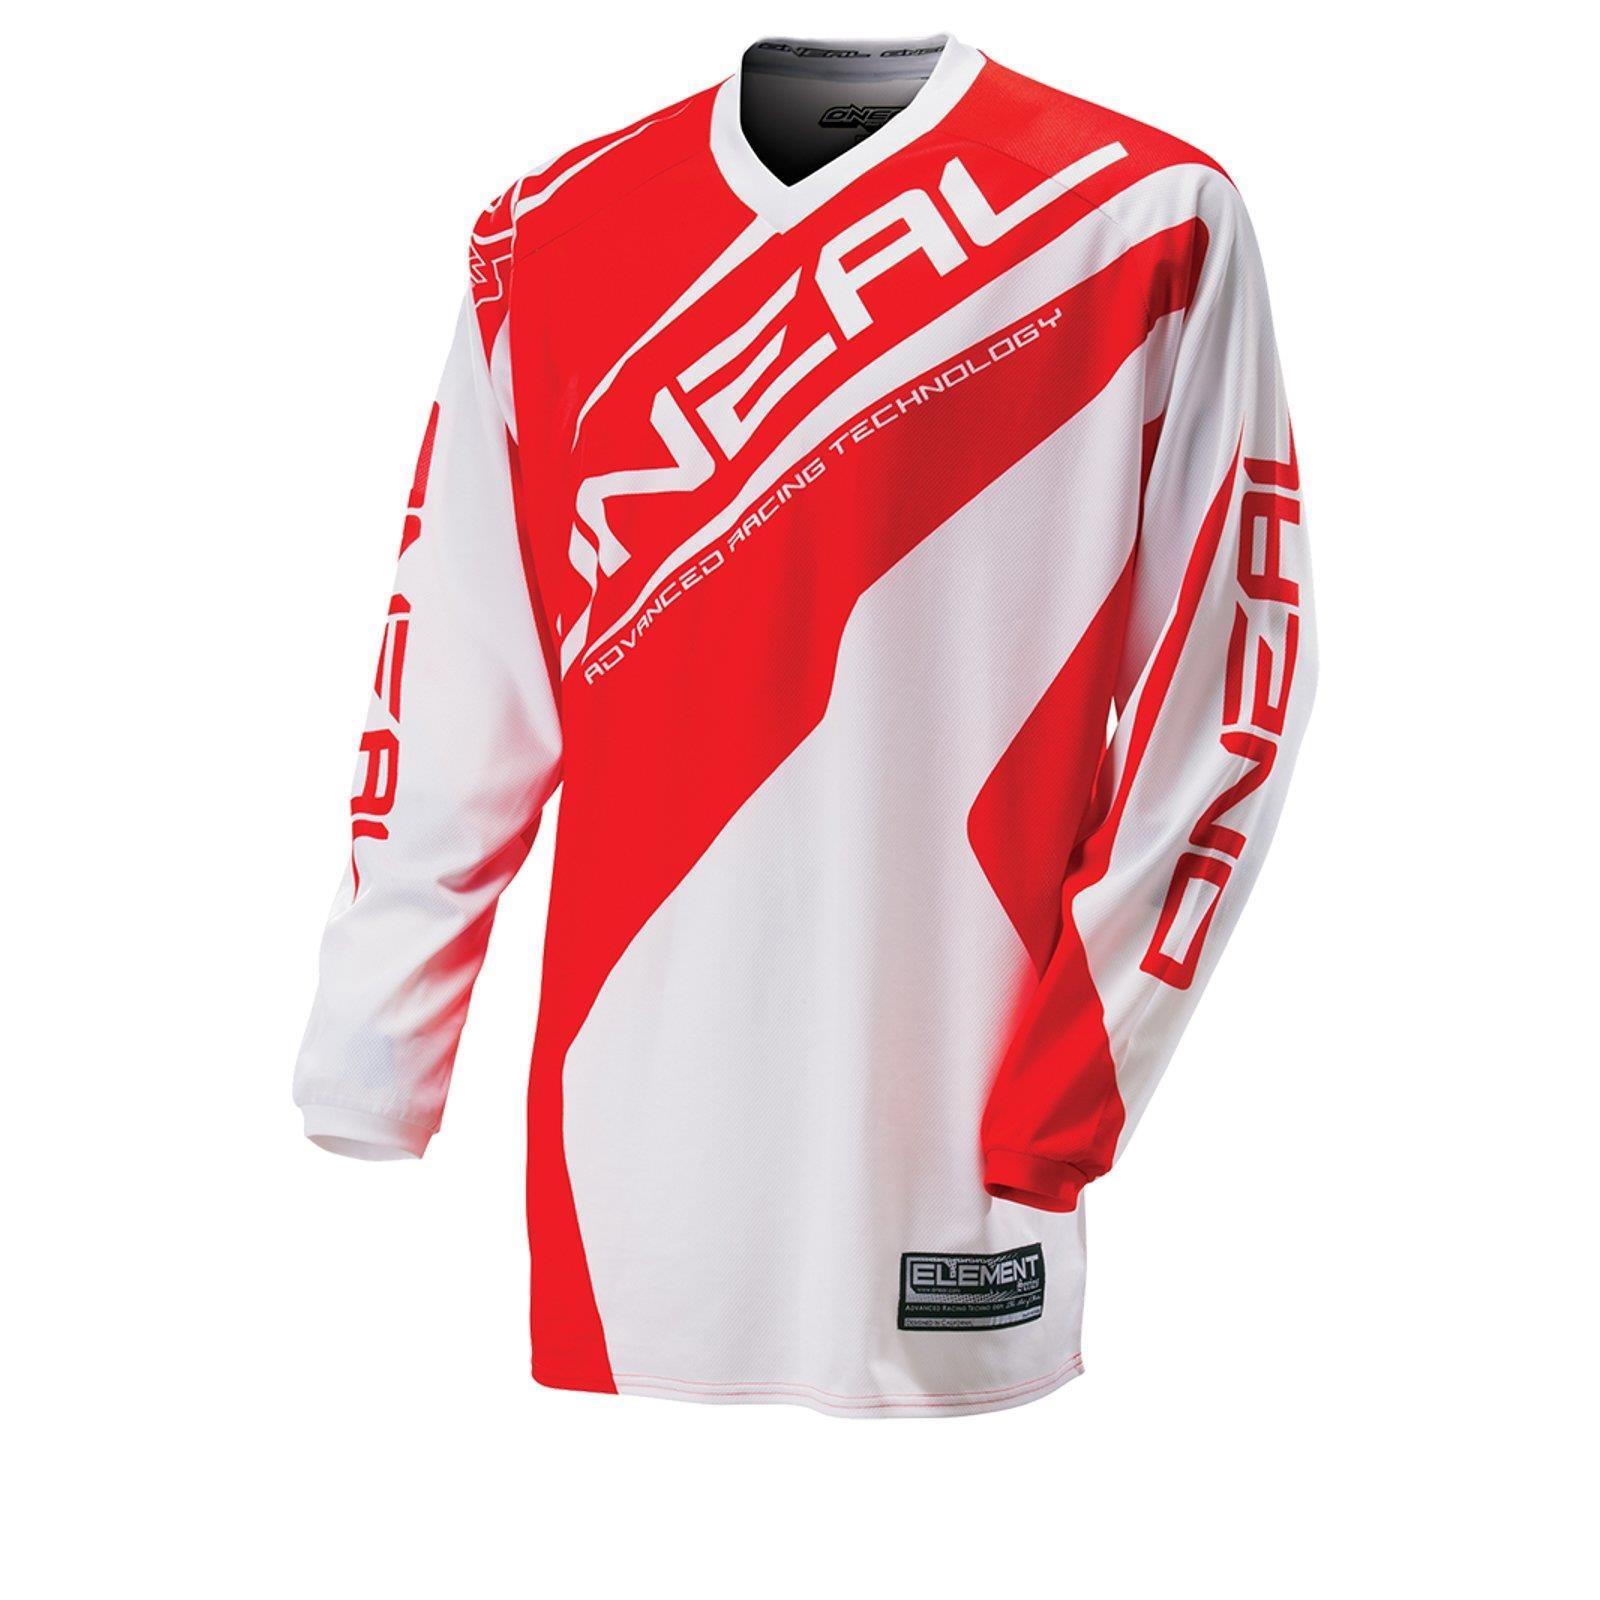 O-039-Neal-elemento-Mayhem-JERSEY-Racewear-Motocross-Maglia-MX-DH-FR-MTB-MOUNTAIN-BIKE miniatura 103